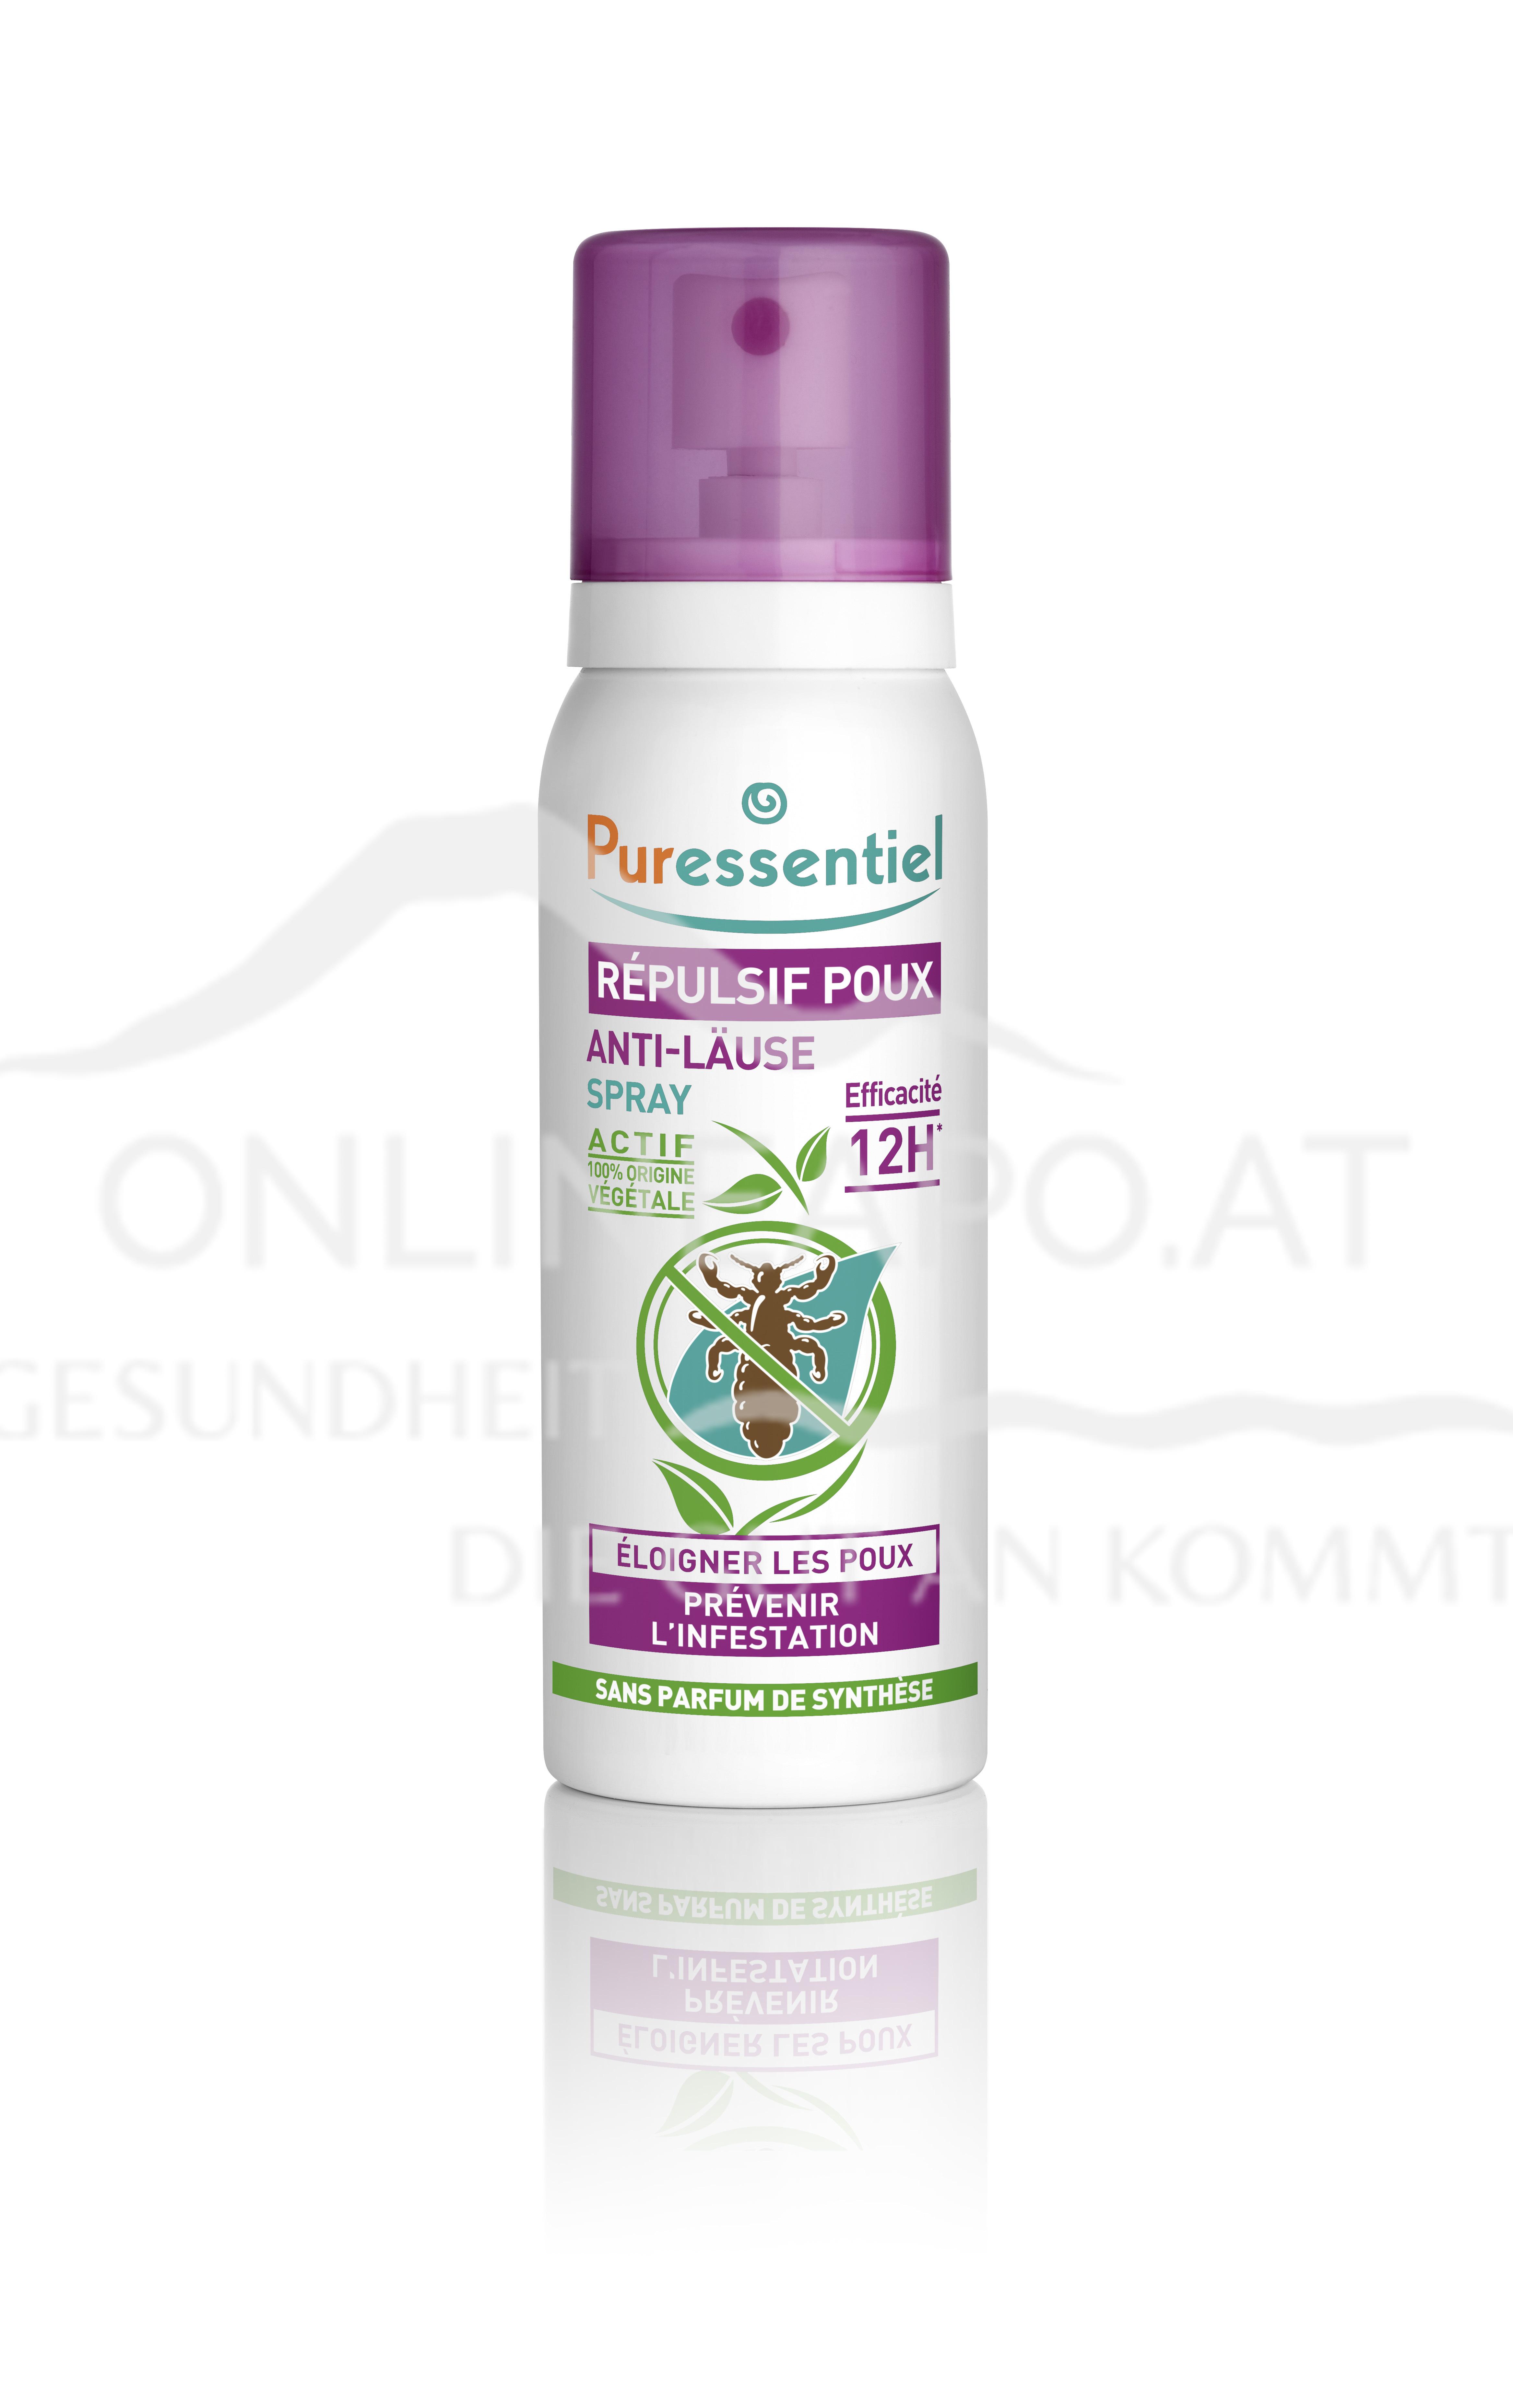 Puressentiel Anti-Läuse Spray